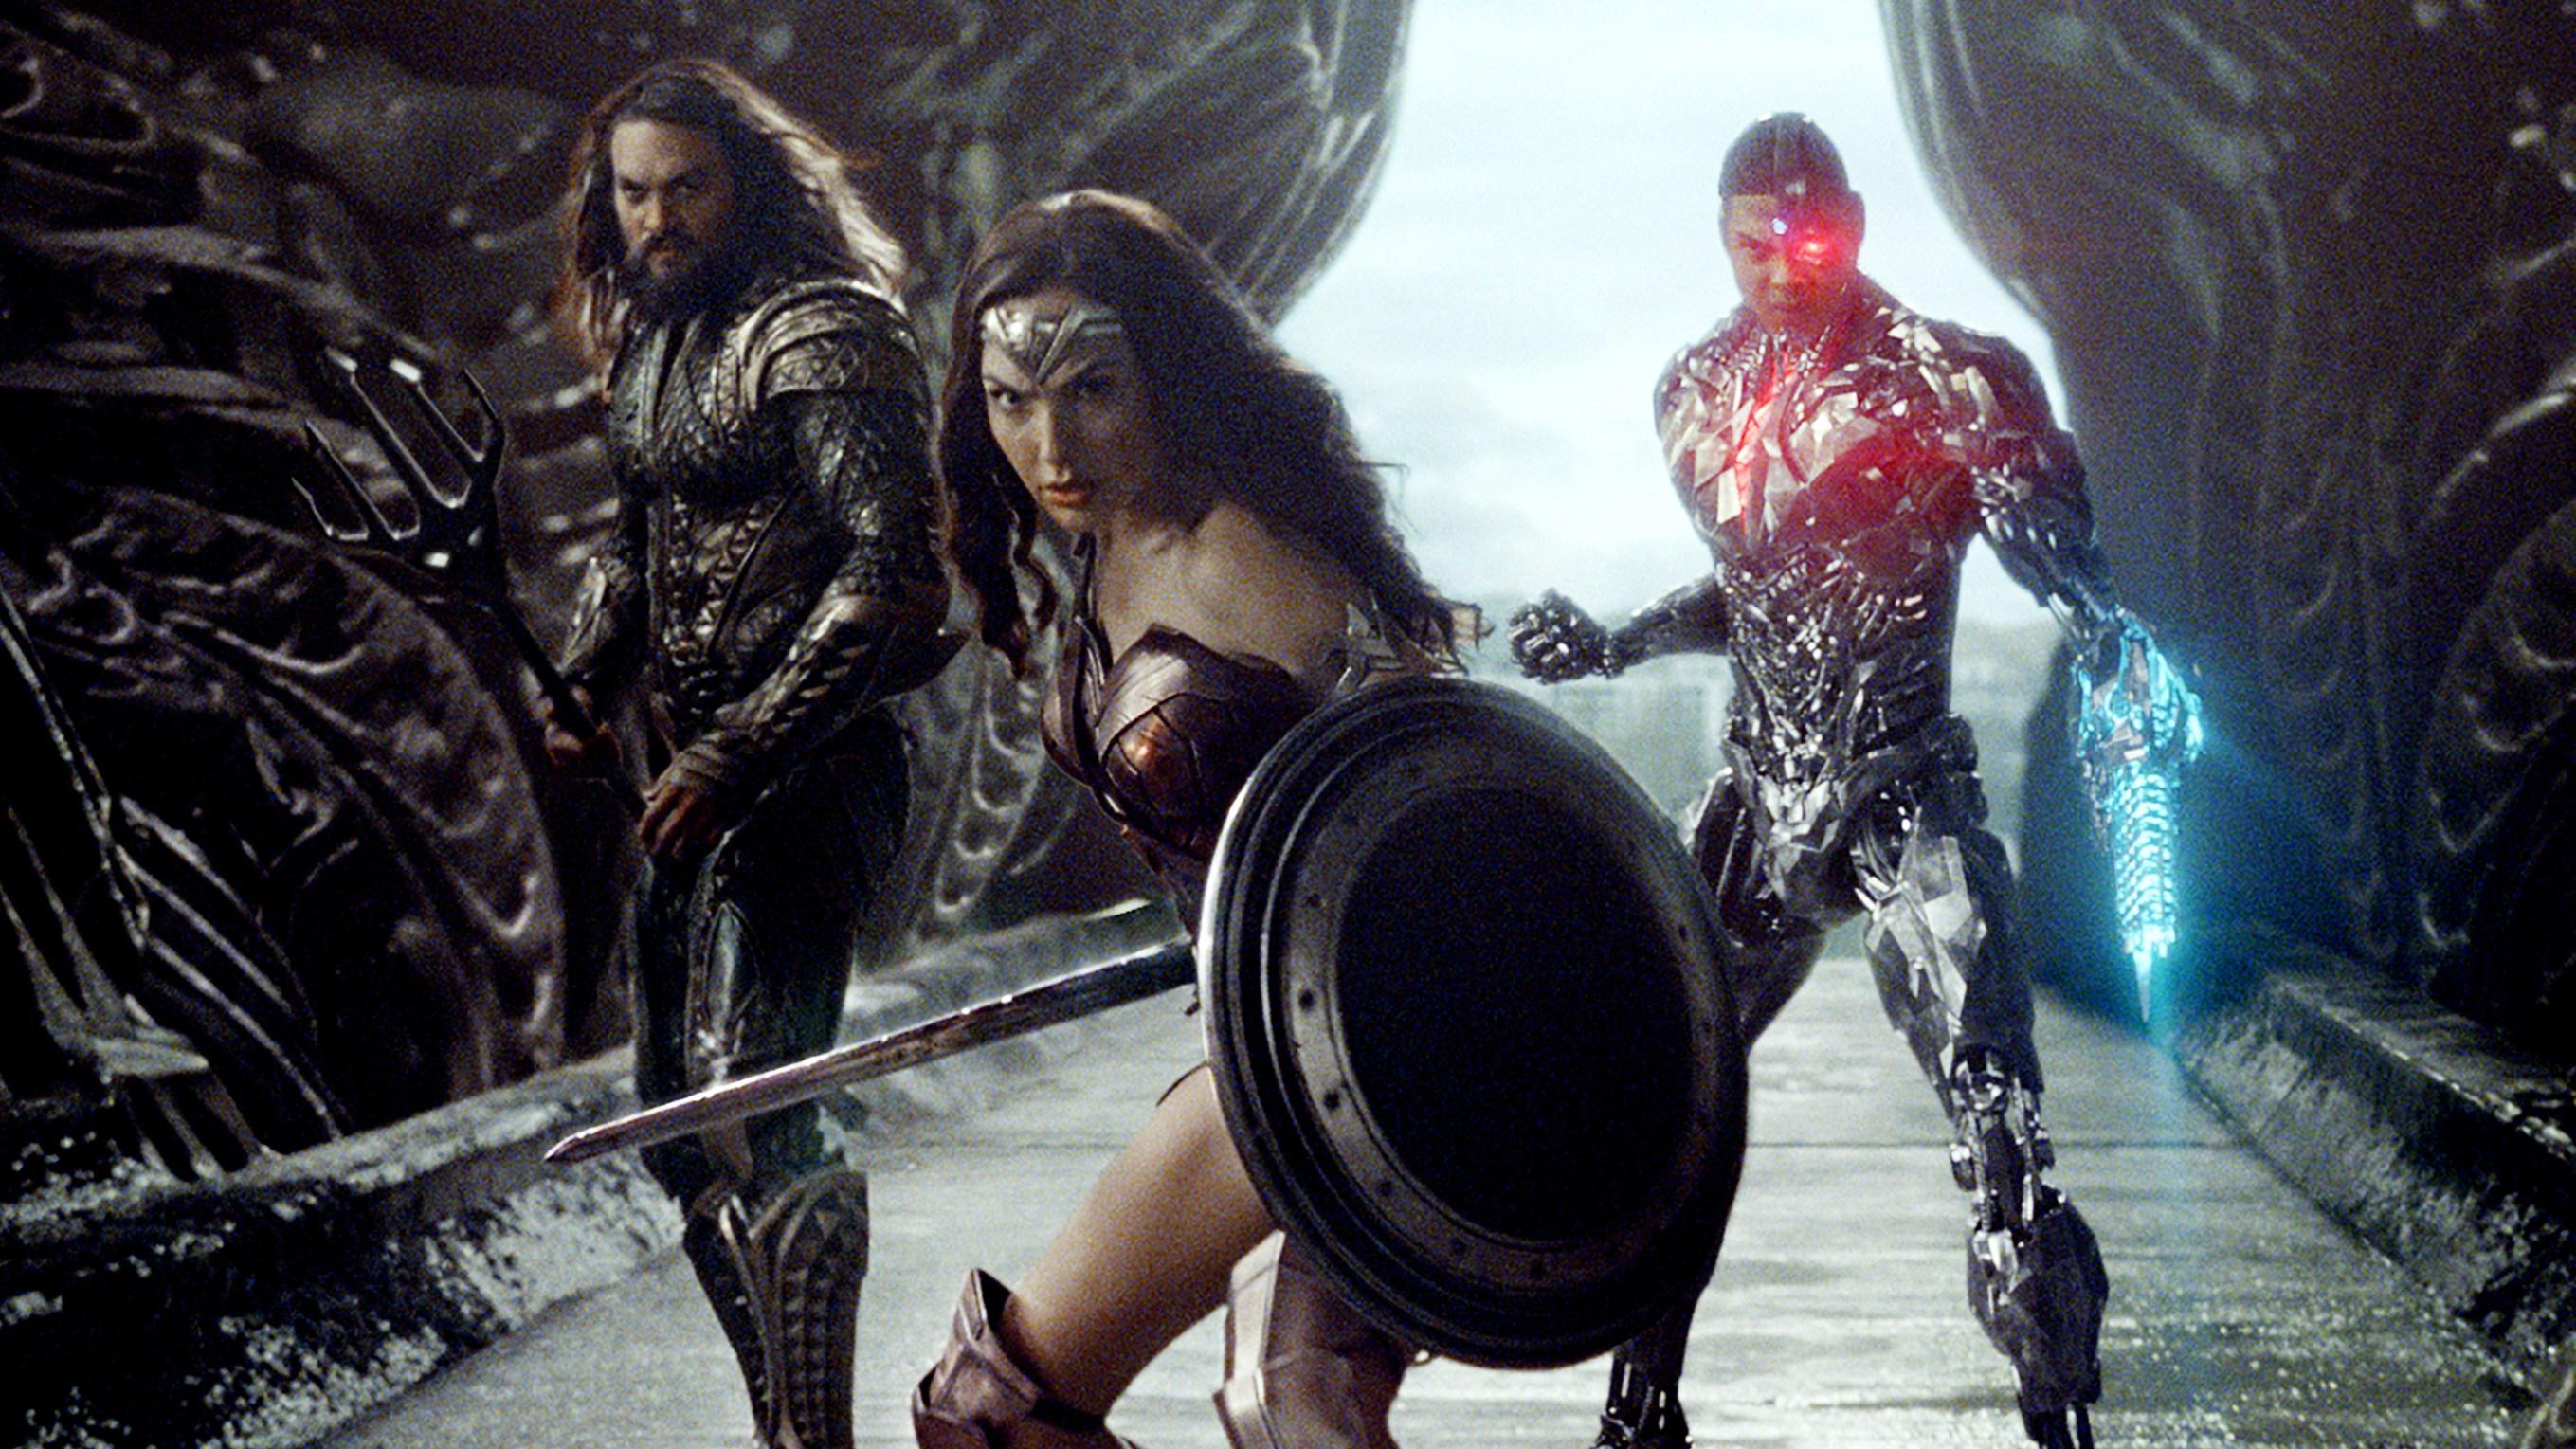 Aquaman (Jason Momoa), Wonder Woman (Gal Gadot) and Cyborg (Ray Fisher) - Justice League